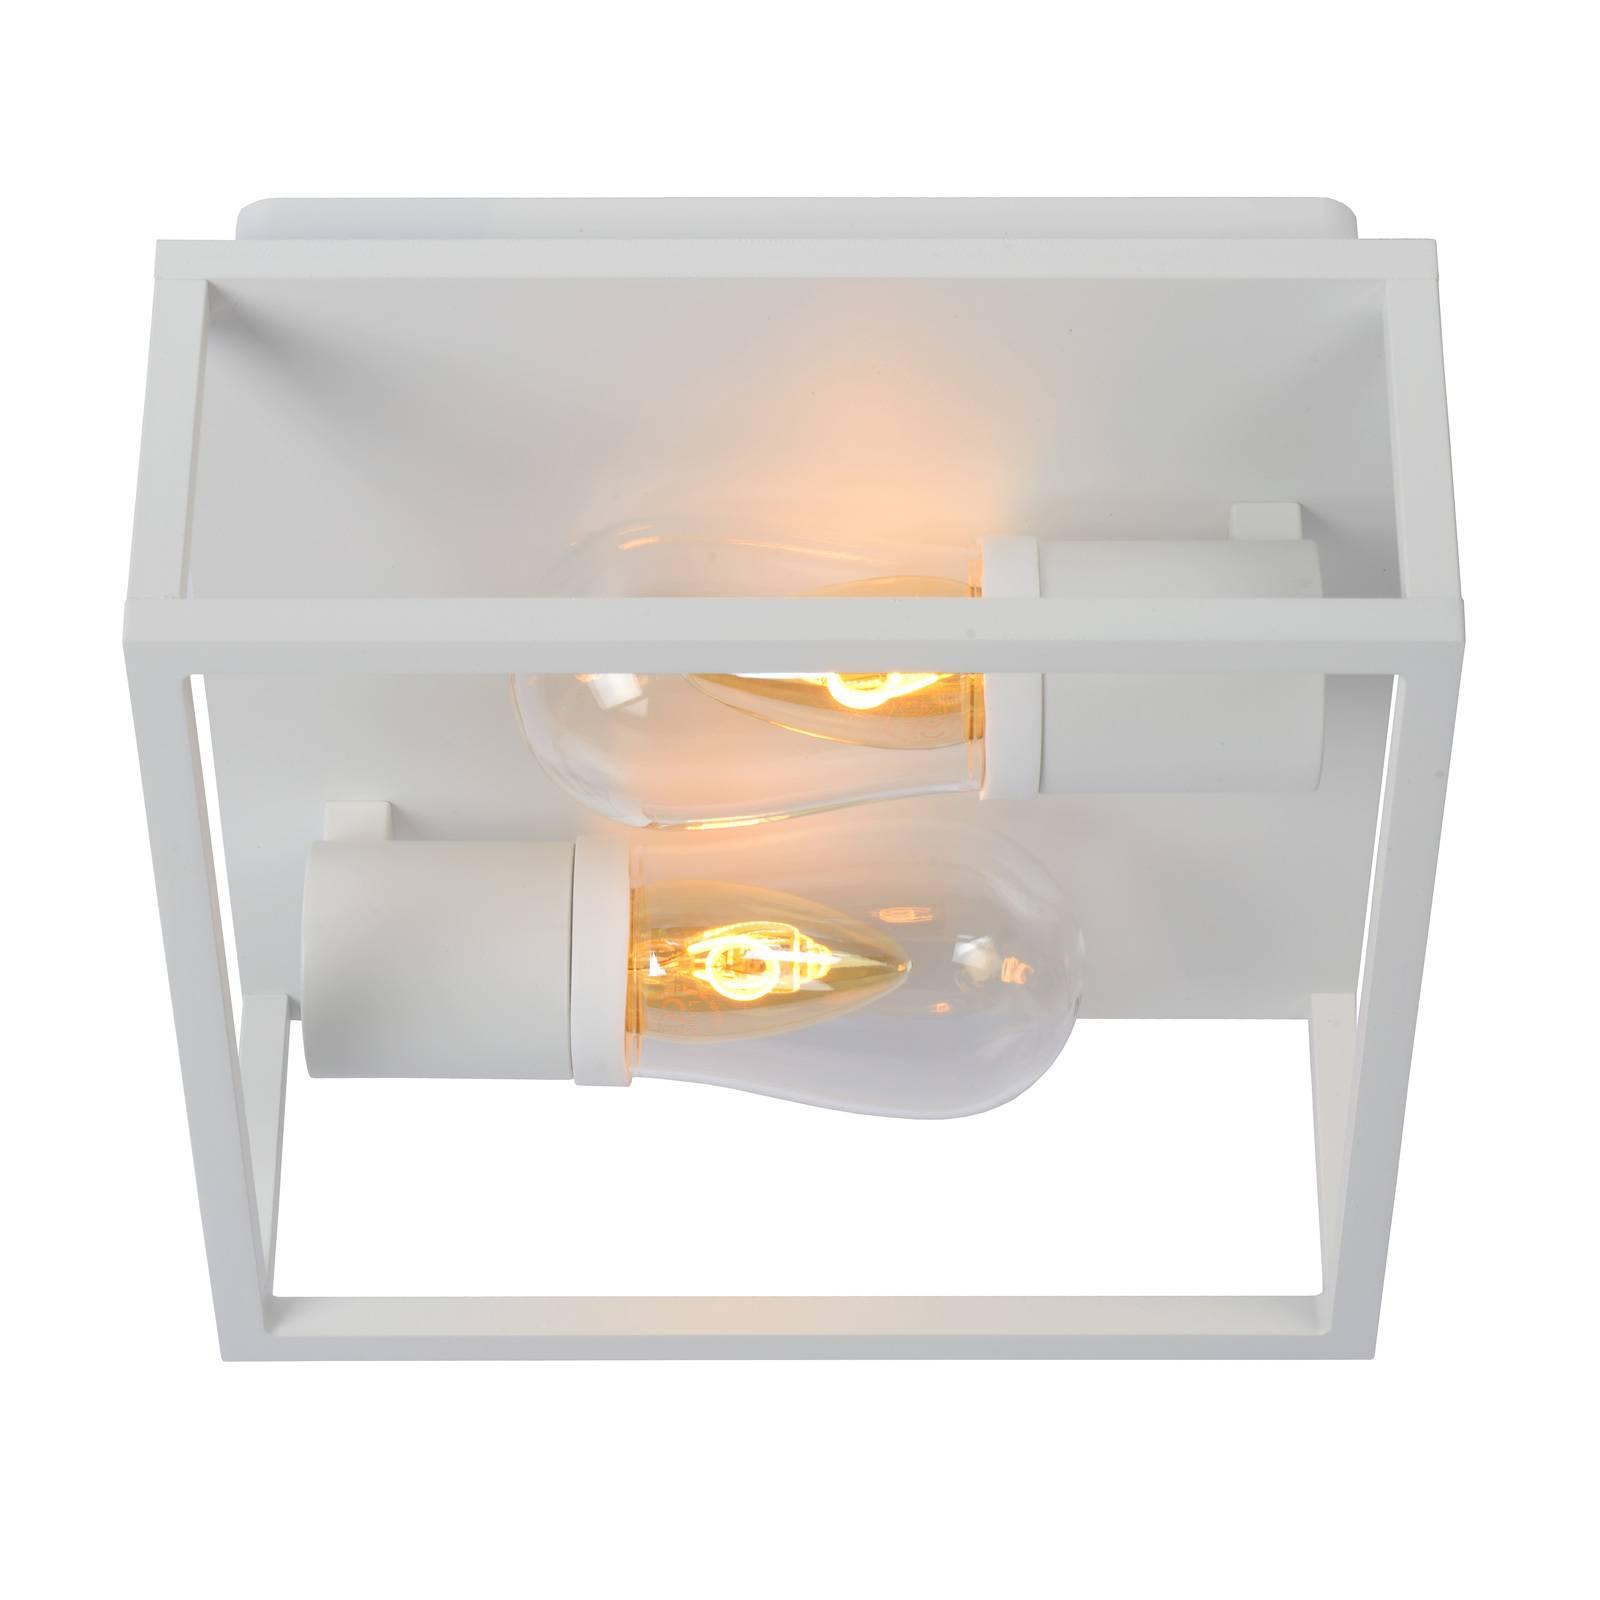 Plafondlamp Carlyn badkamer 2-lamps wit